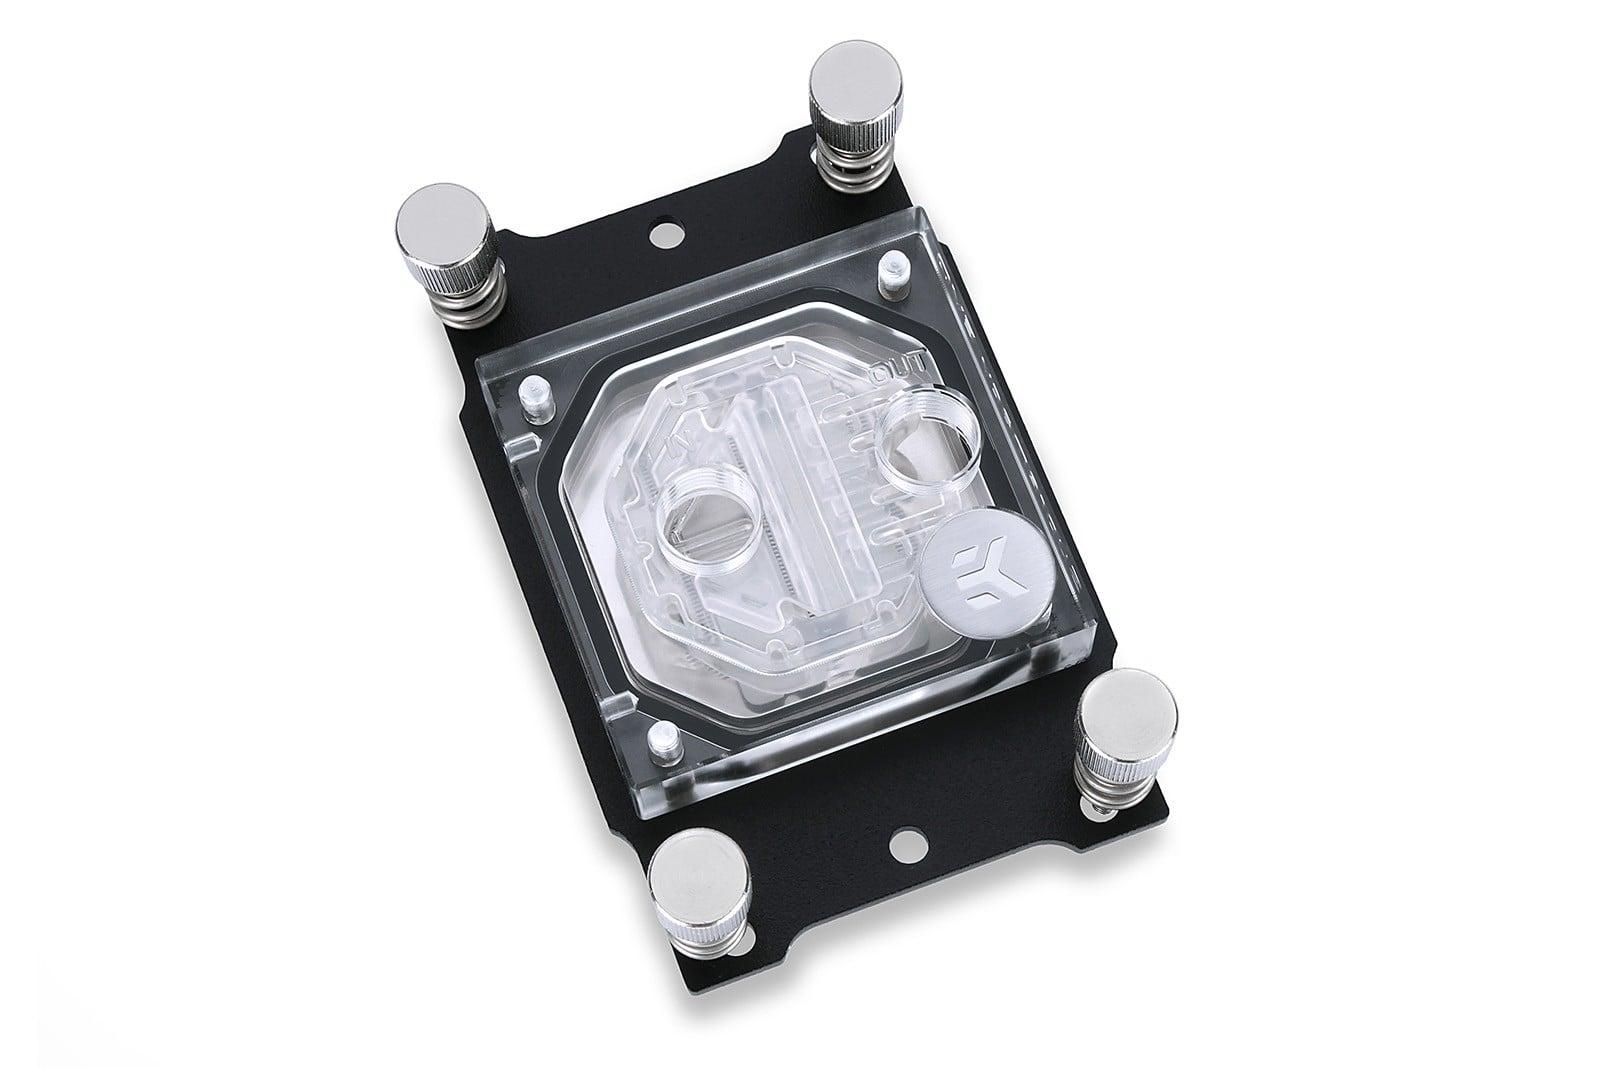 EK-Supremacy EVO AMD - Nickel